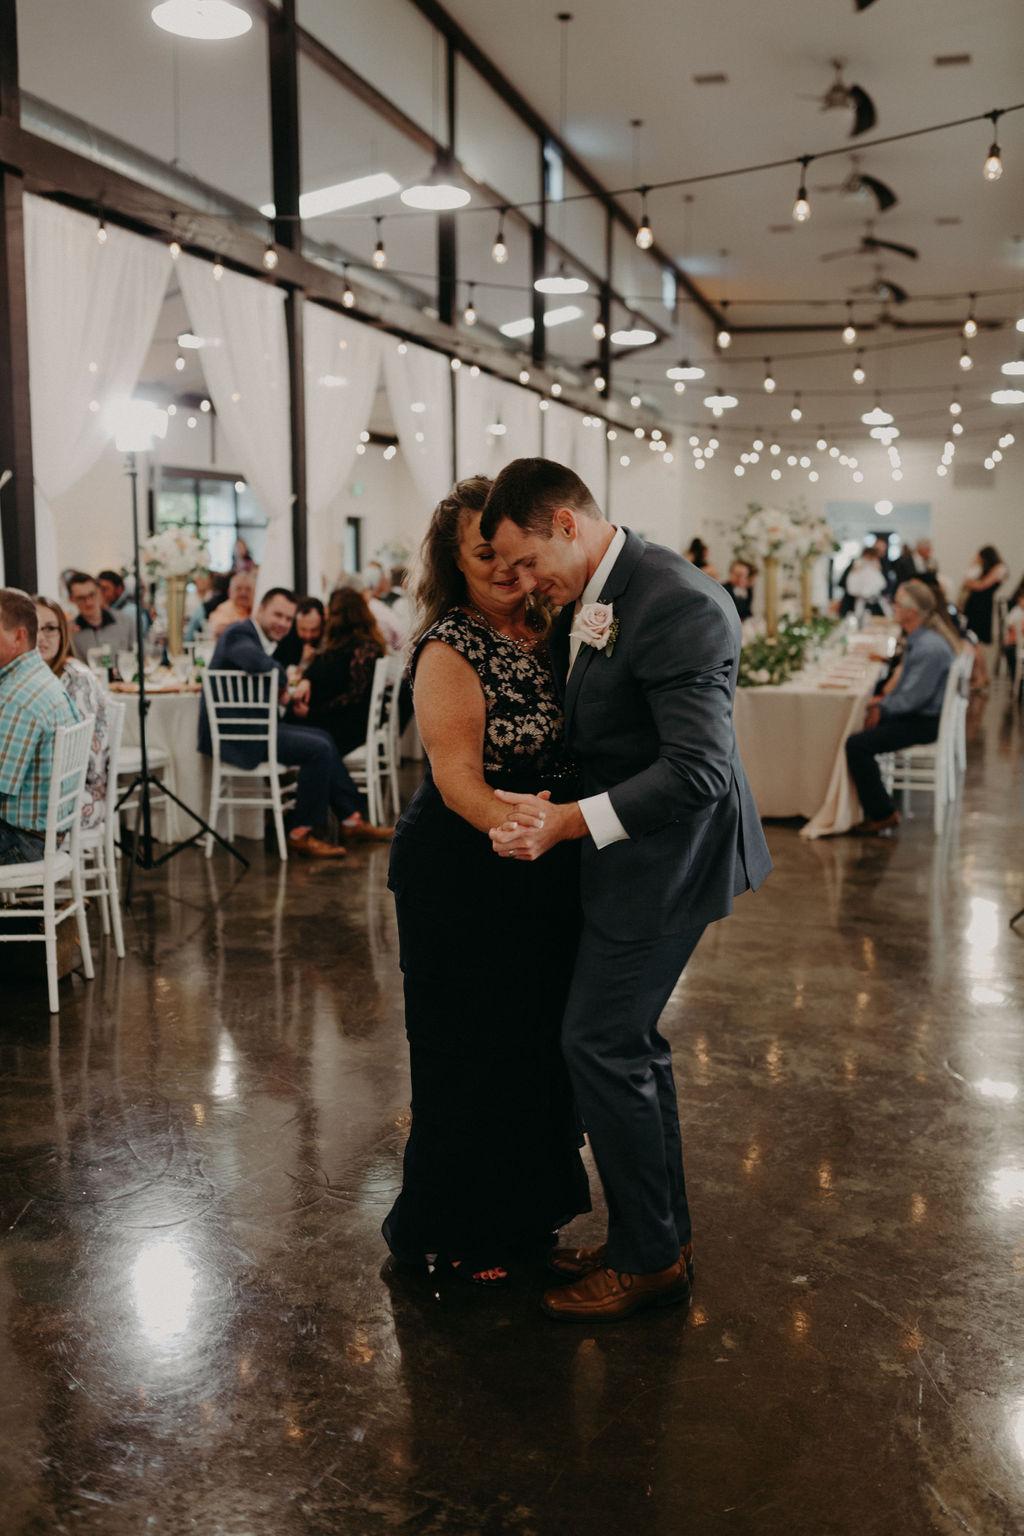 Best Oklahoma Outdoor Wedding Venue Tulsa Bixby White Barn 64.jpg